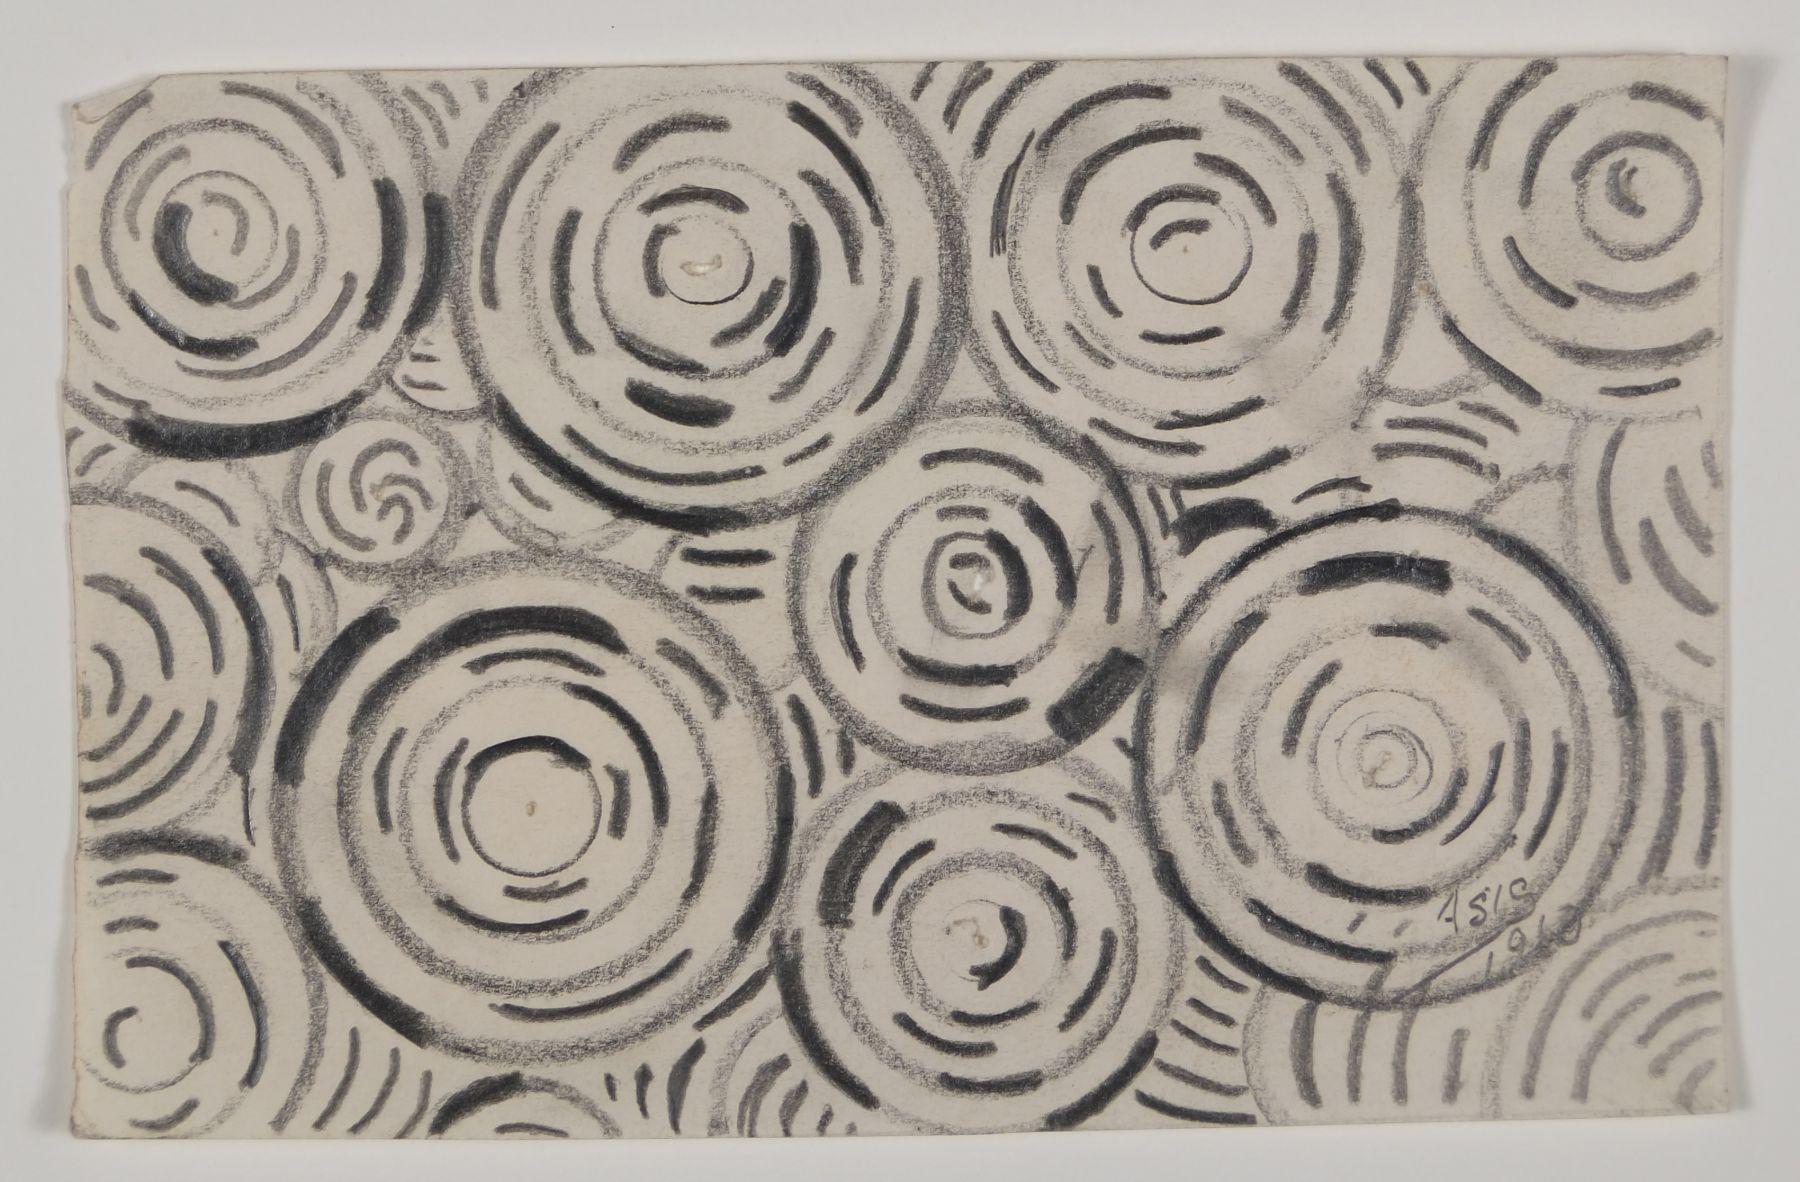 Antonio Asis,Untitled, 1960,Graphite on paper,3 1/2 x 5 7/16 in. (8.9 x 13.9 cm.)